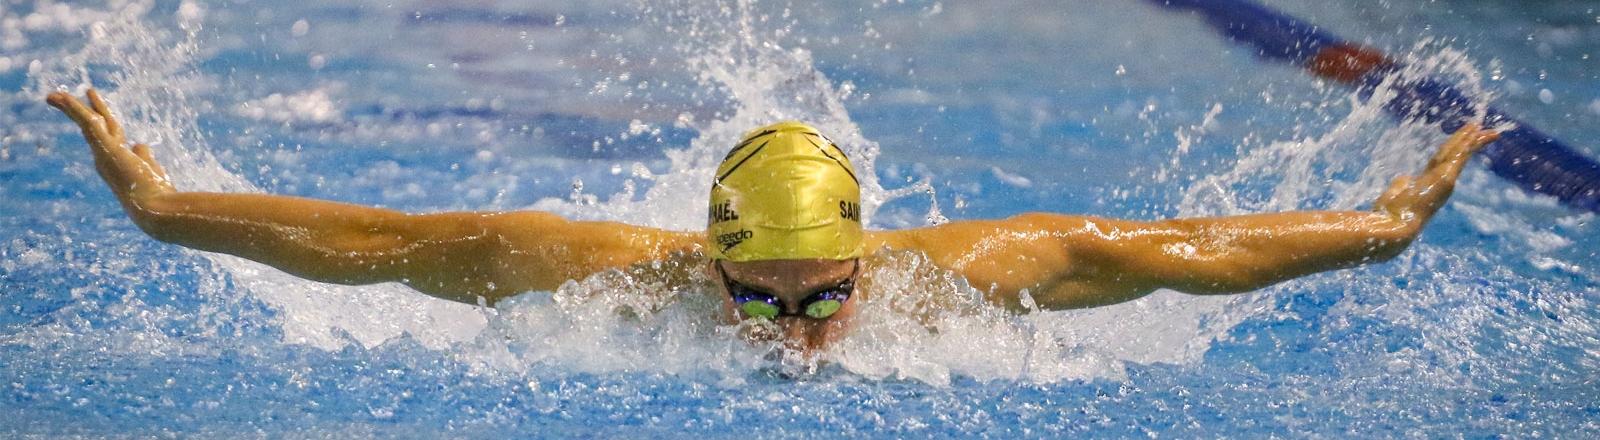 groupes - sportifs natation